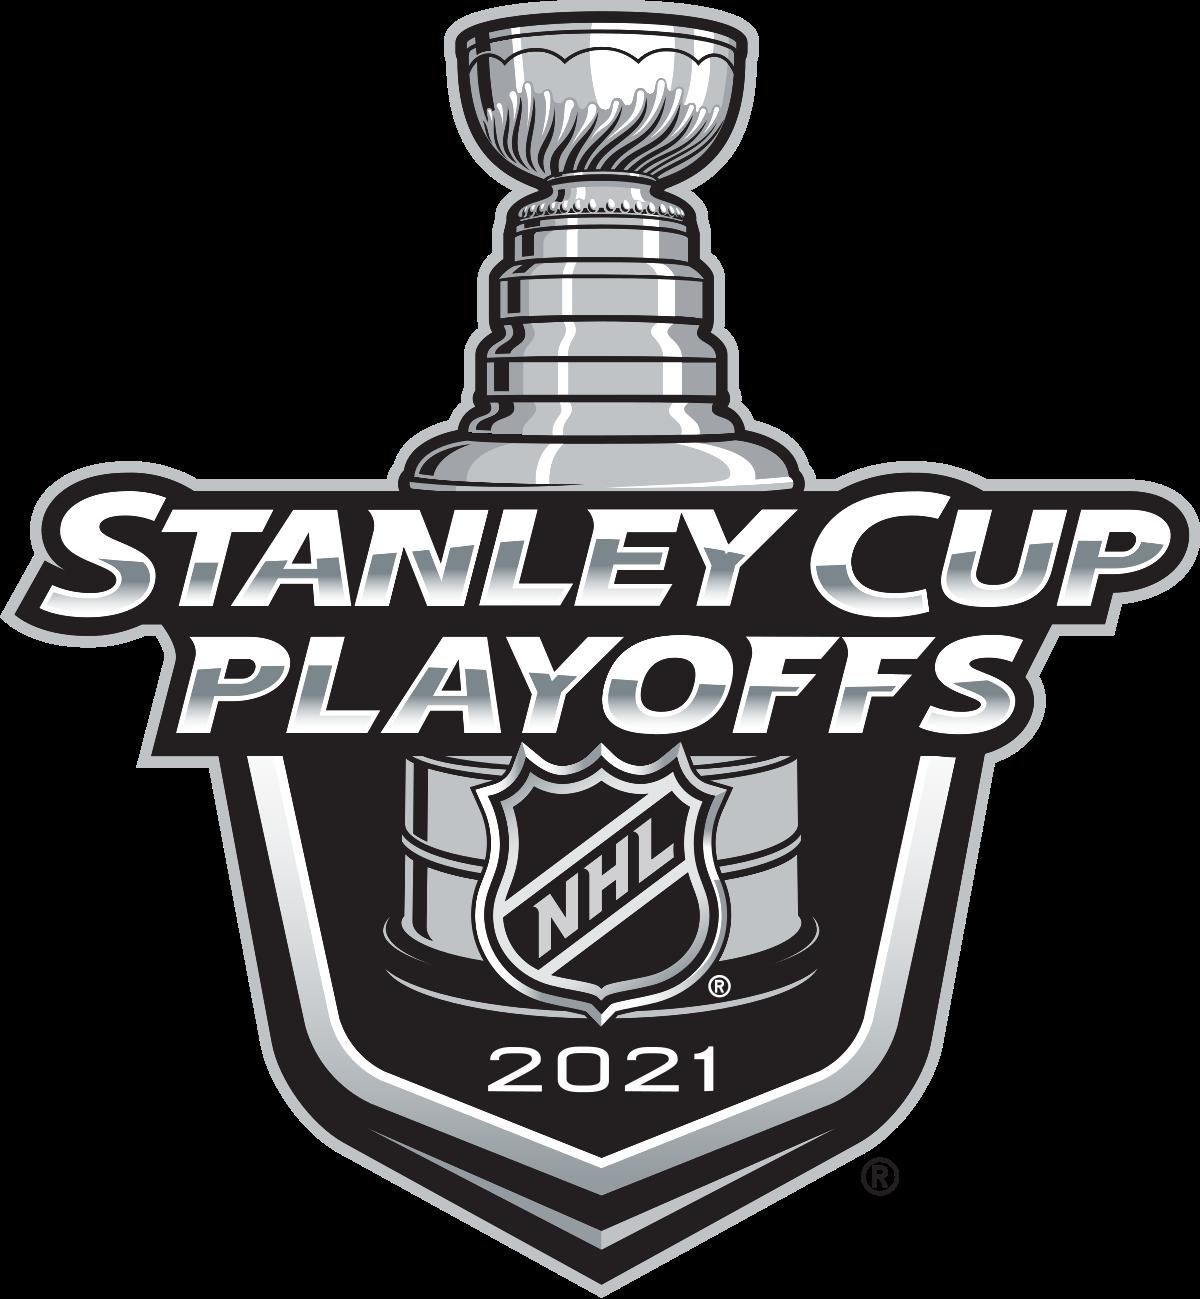 2021 Stanley Cup playoffs - Wikipedia